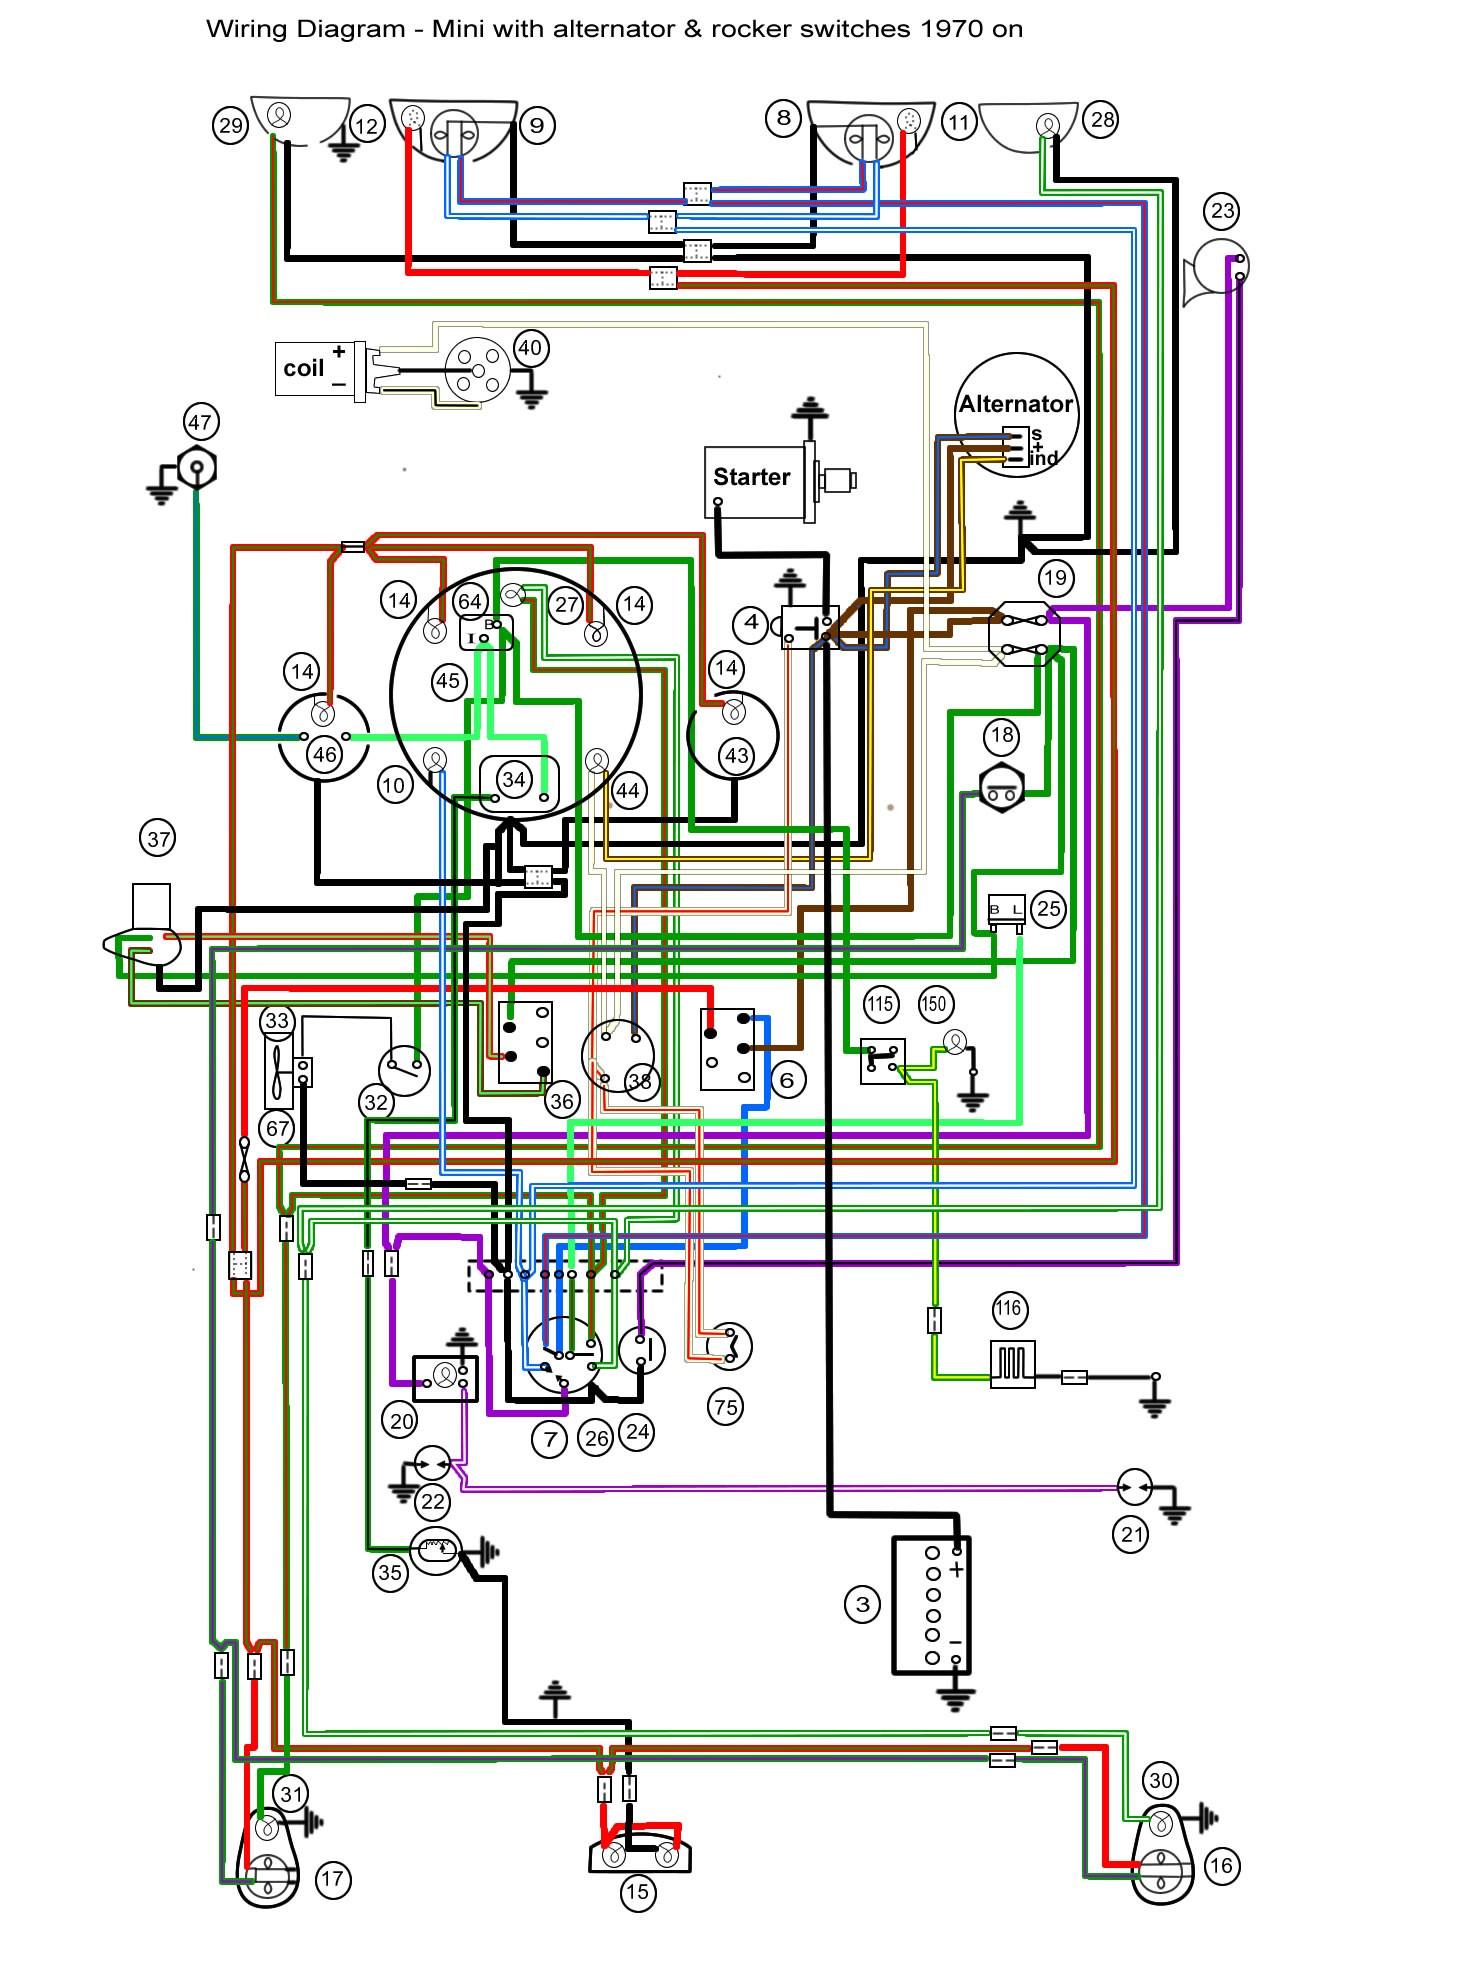 Race Car Wiring Diagram Suzuki Turn Signal Diagrams Rocker Switch Mini Mania Info Of